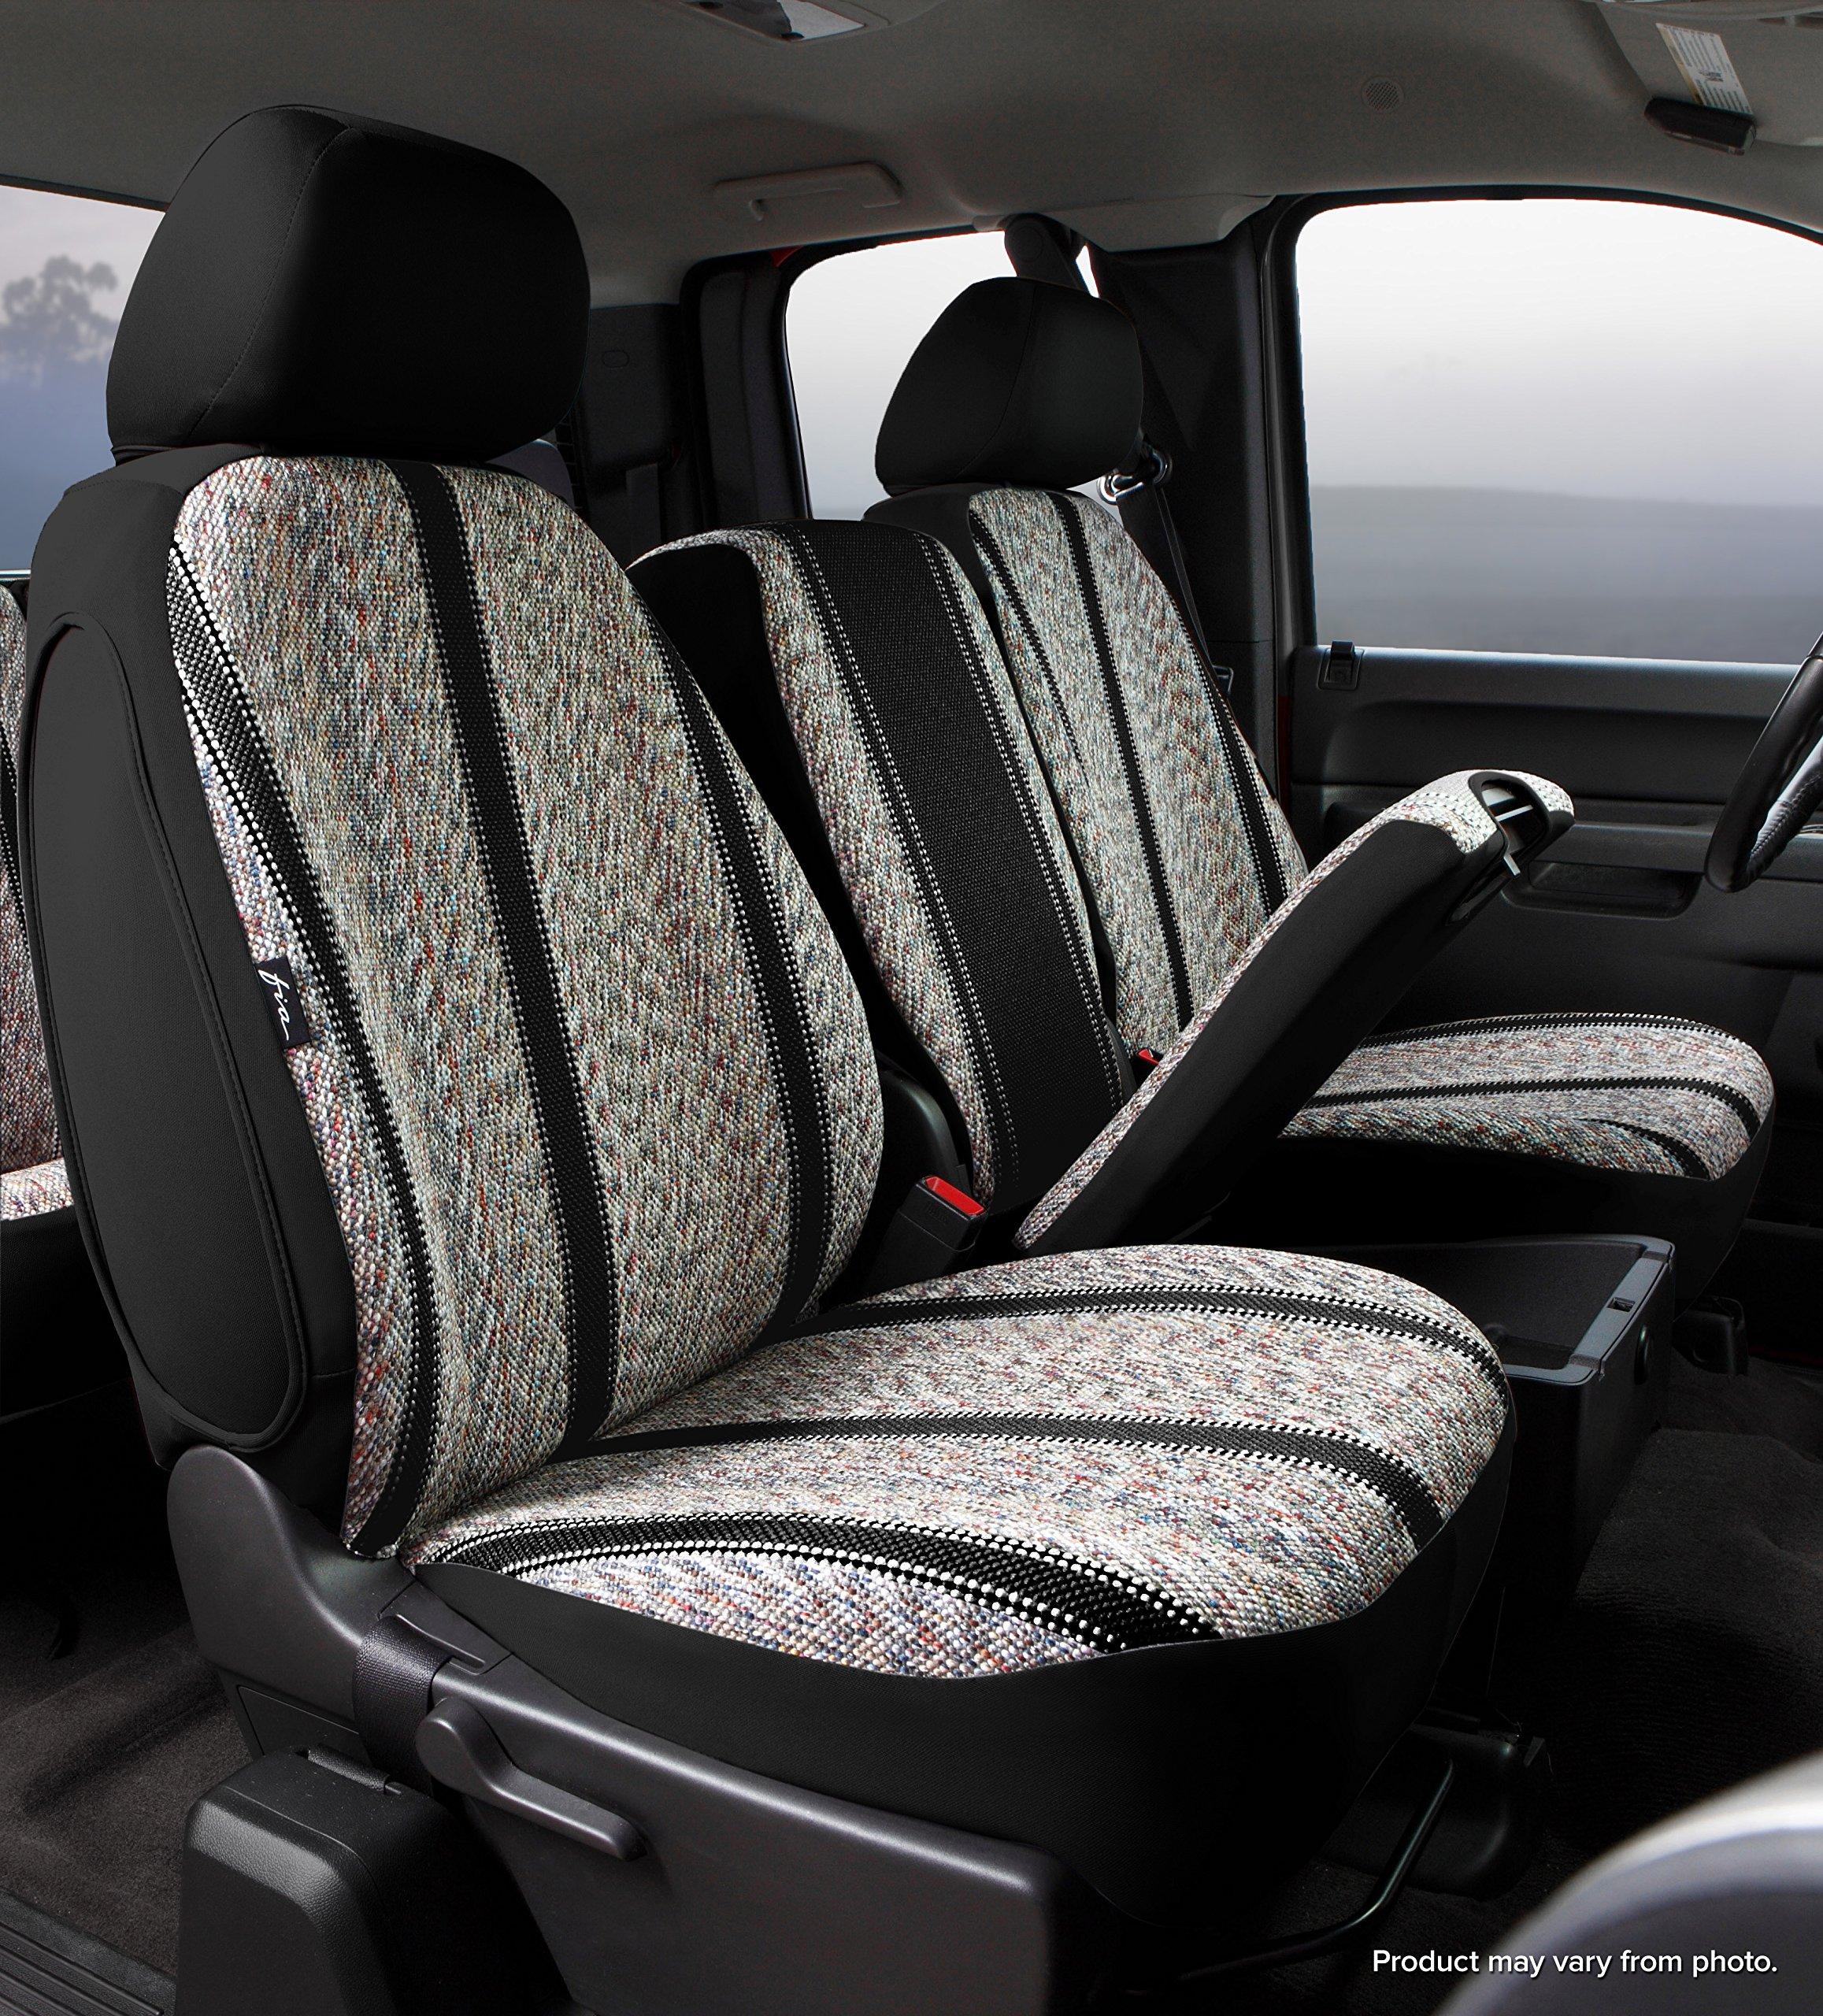 Fia TR47-35 BLACK Custom Fit Front Seat Cover Split Seat 40/20/40 - Saddle Blanket, (Black)